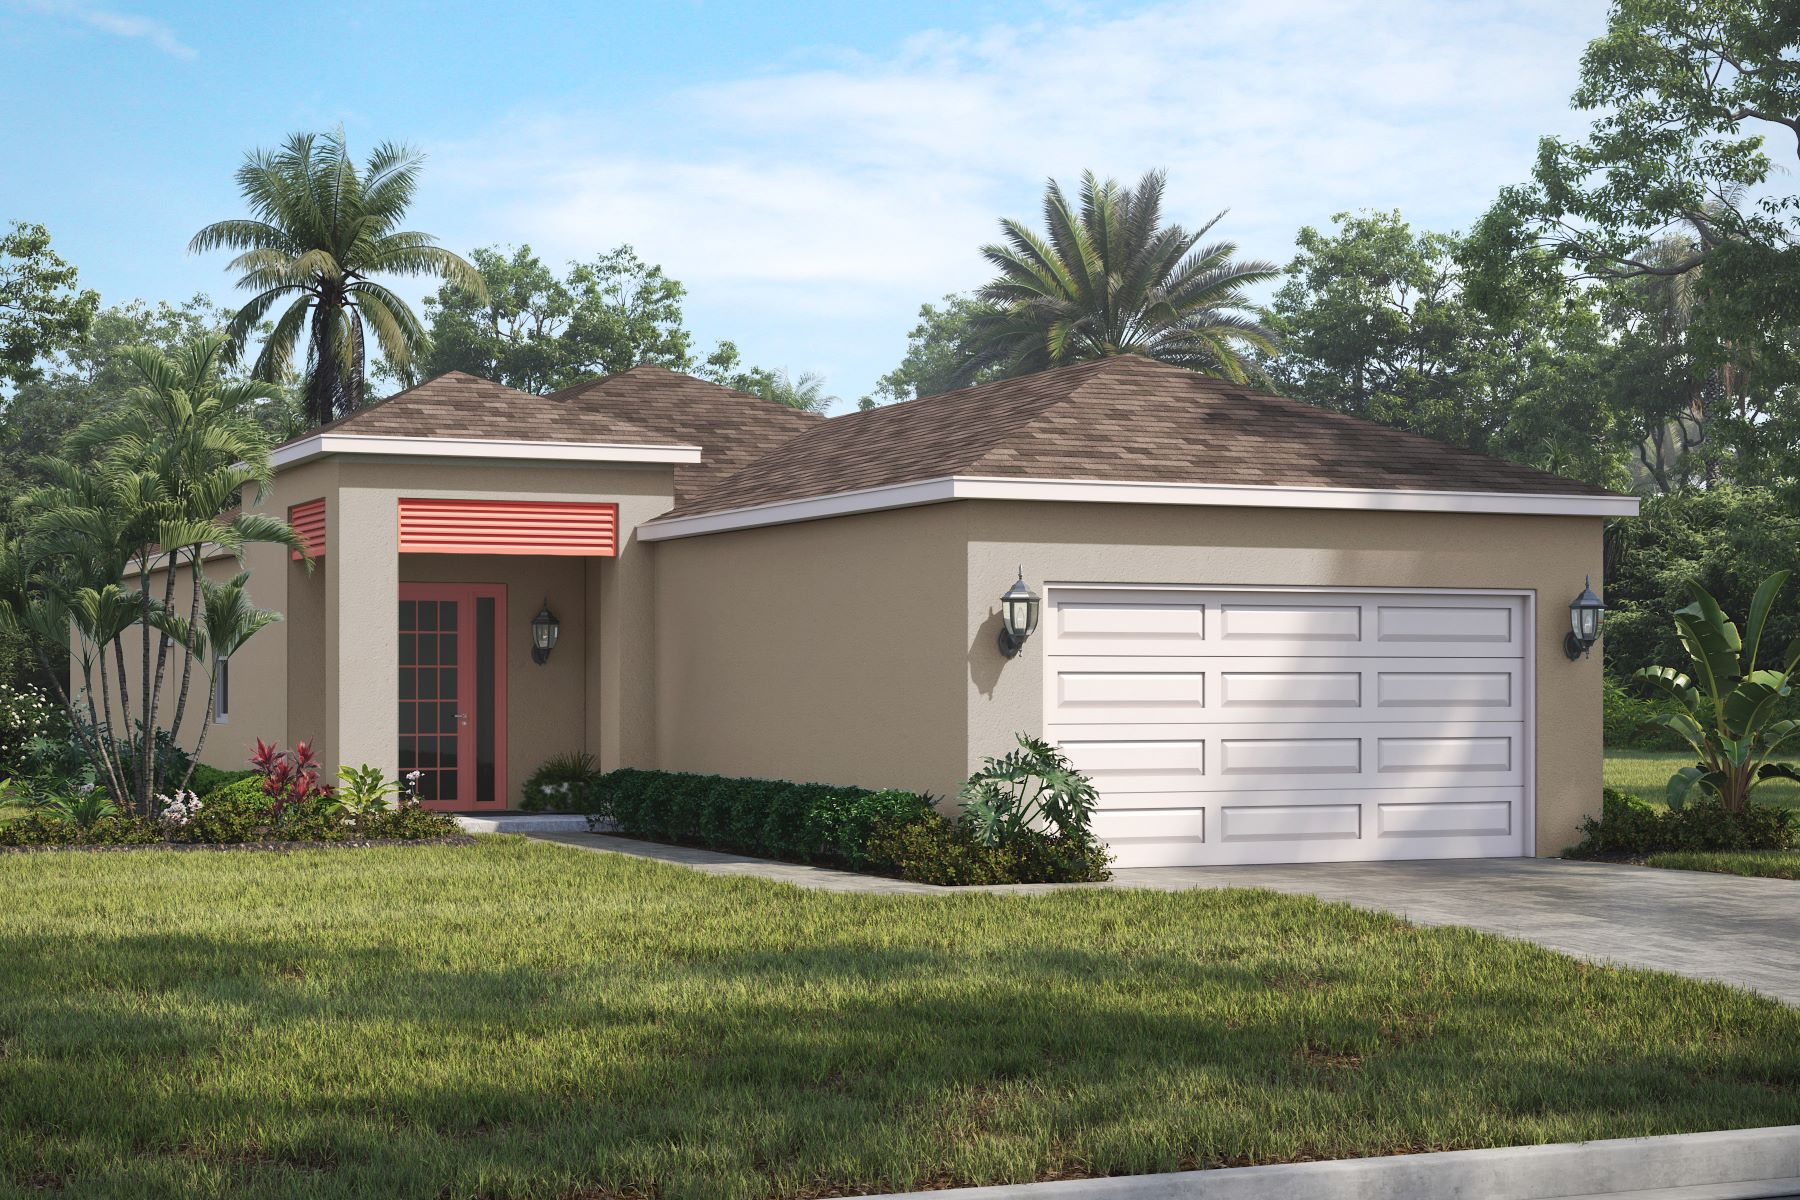 2172 Falls Manor 2172 Falls Manor Vero Beach, Florida 32967 Stati Uniti